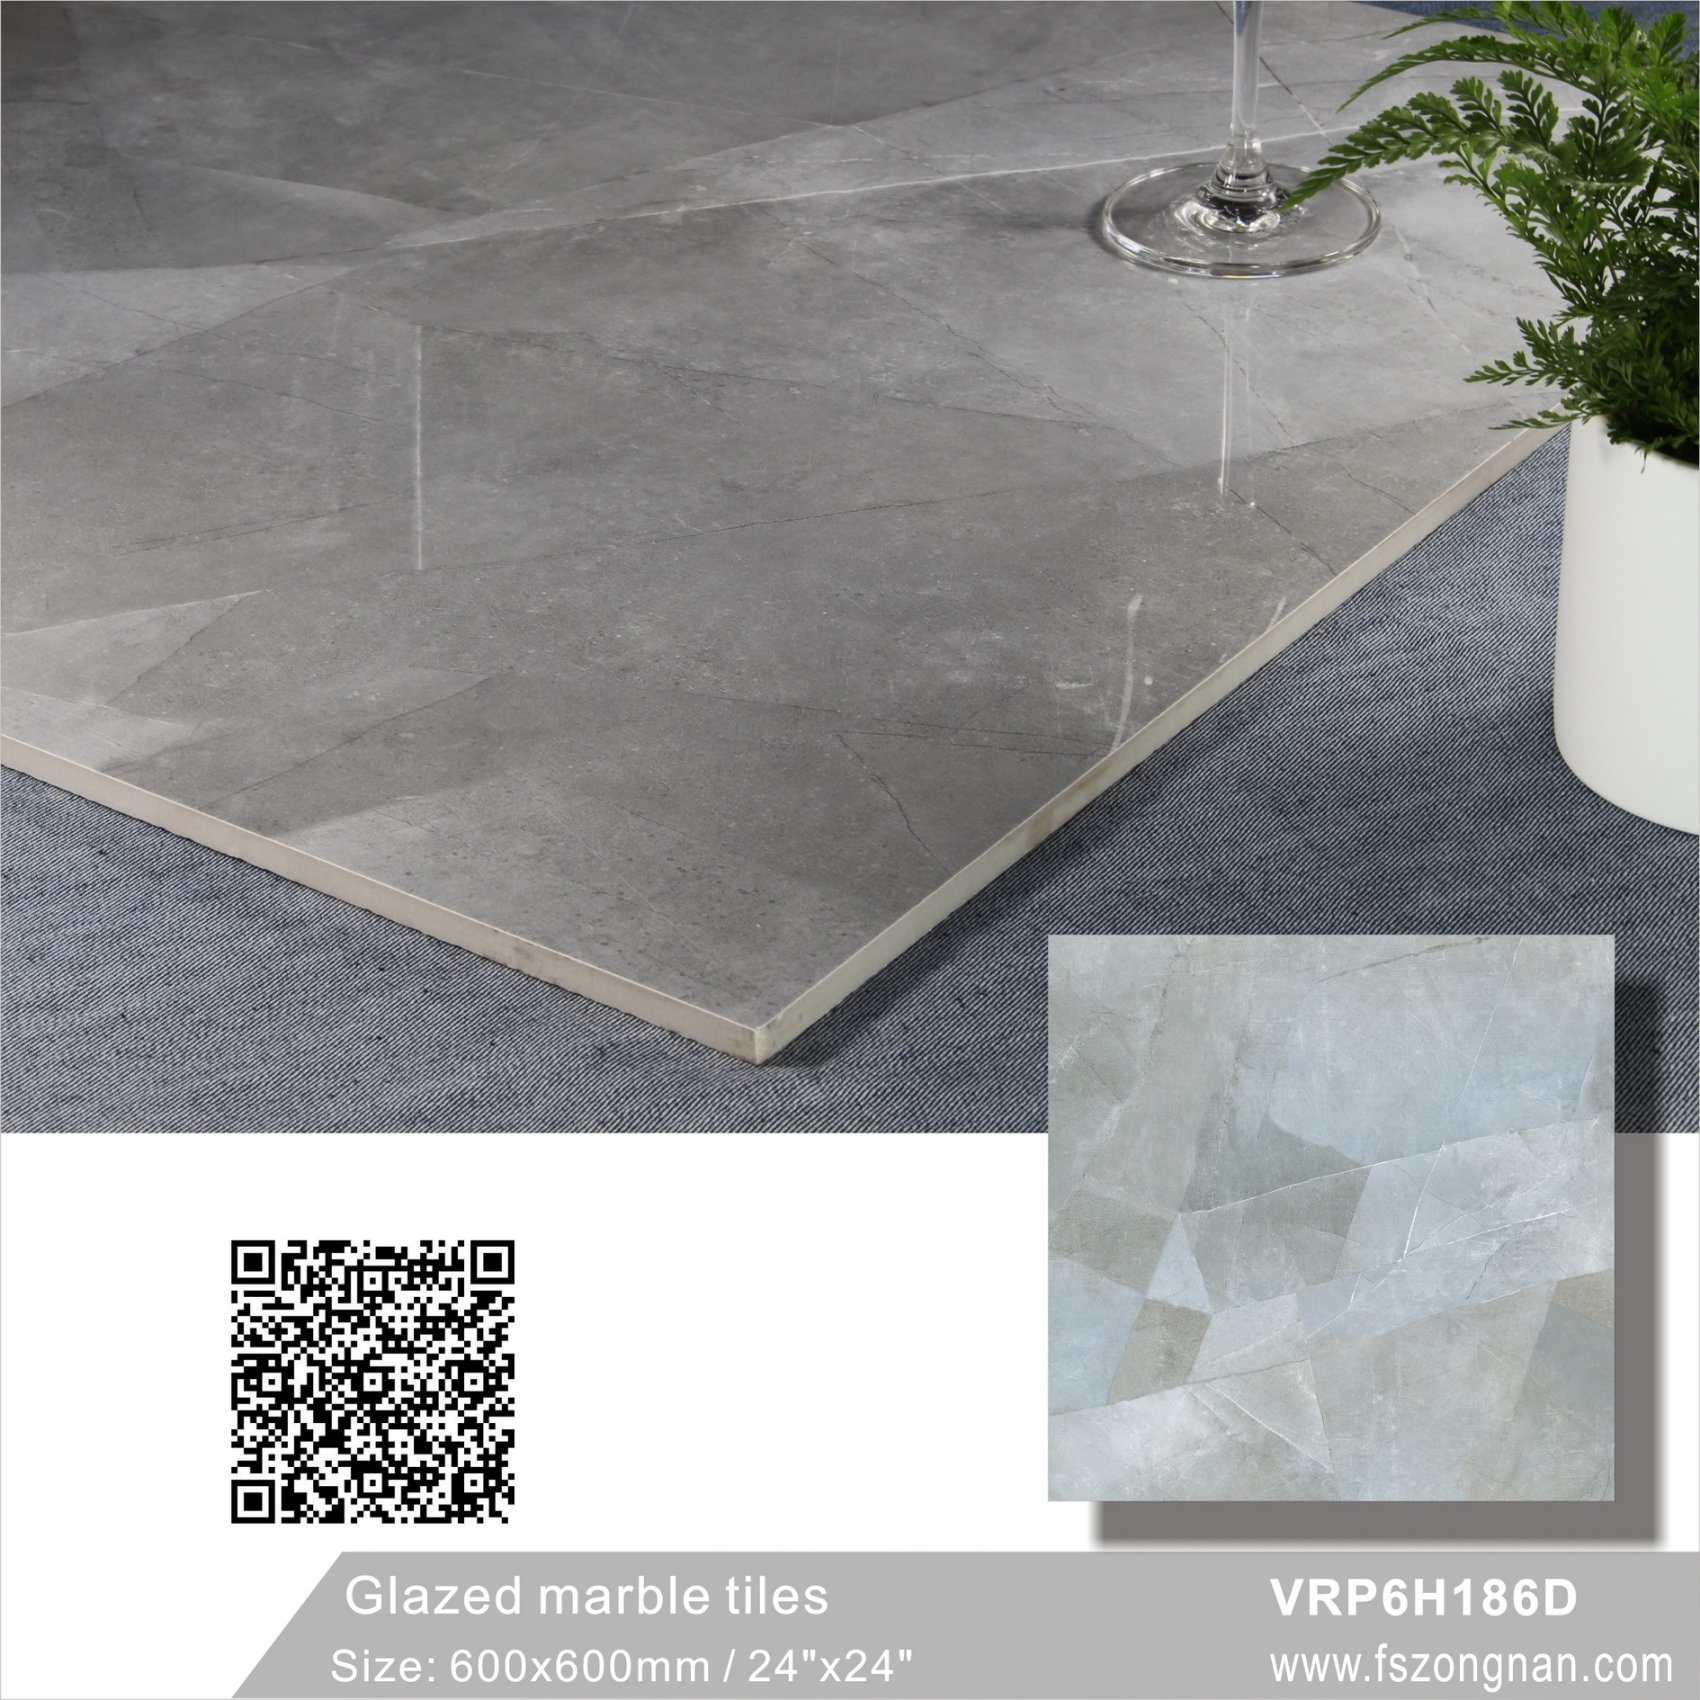 China Carara White Glazed Marble Polished Porcelain Floor Tile for ...